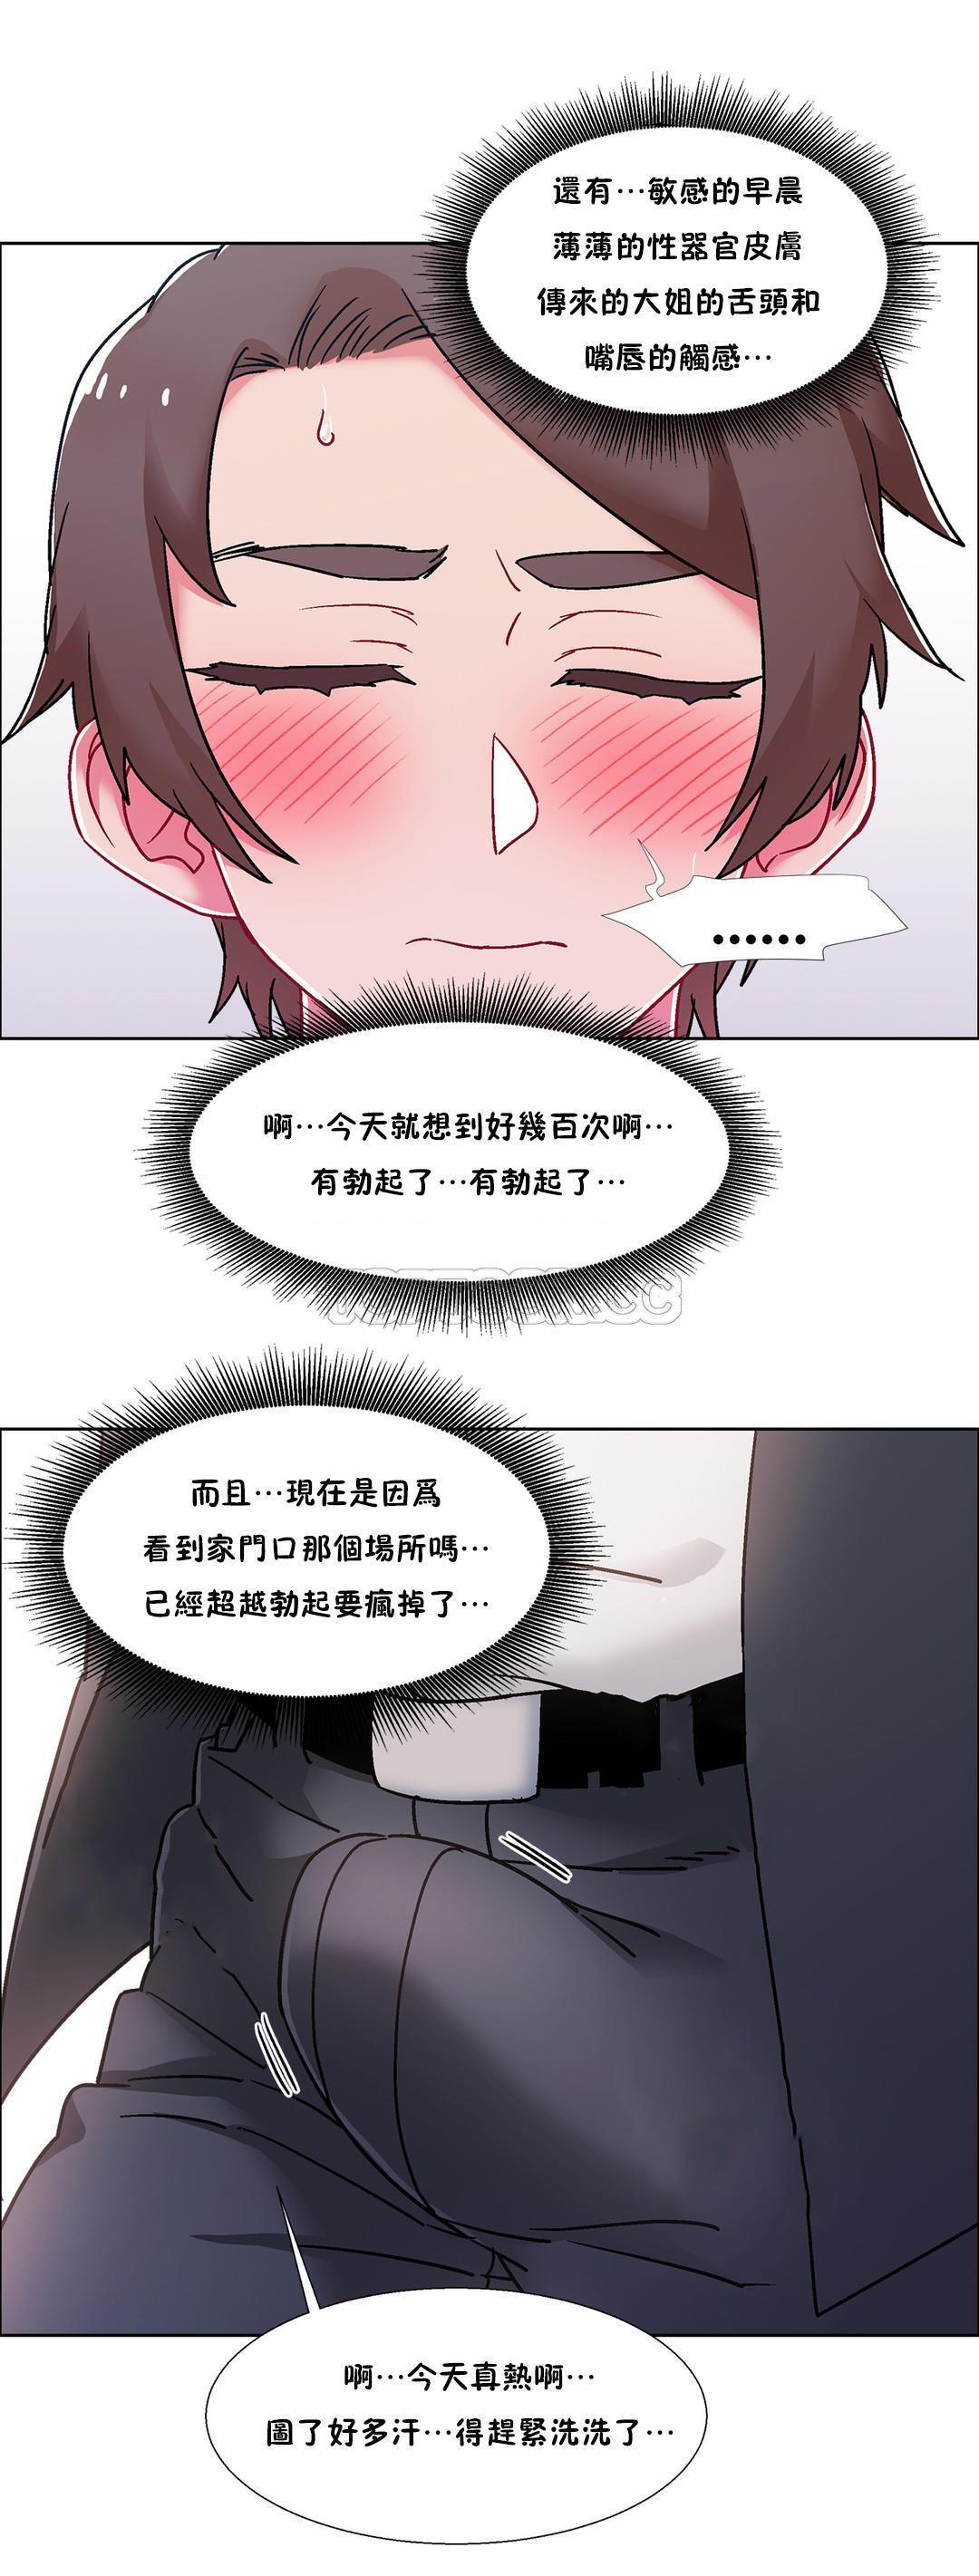 [Studio Wannabe] Rental Girls | 出租女郎 Ch. 33-58 [Chinese]  第二季 完结 442